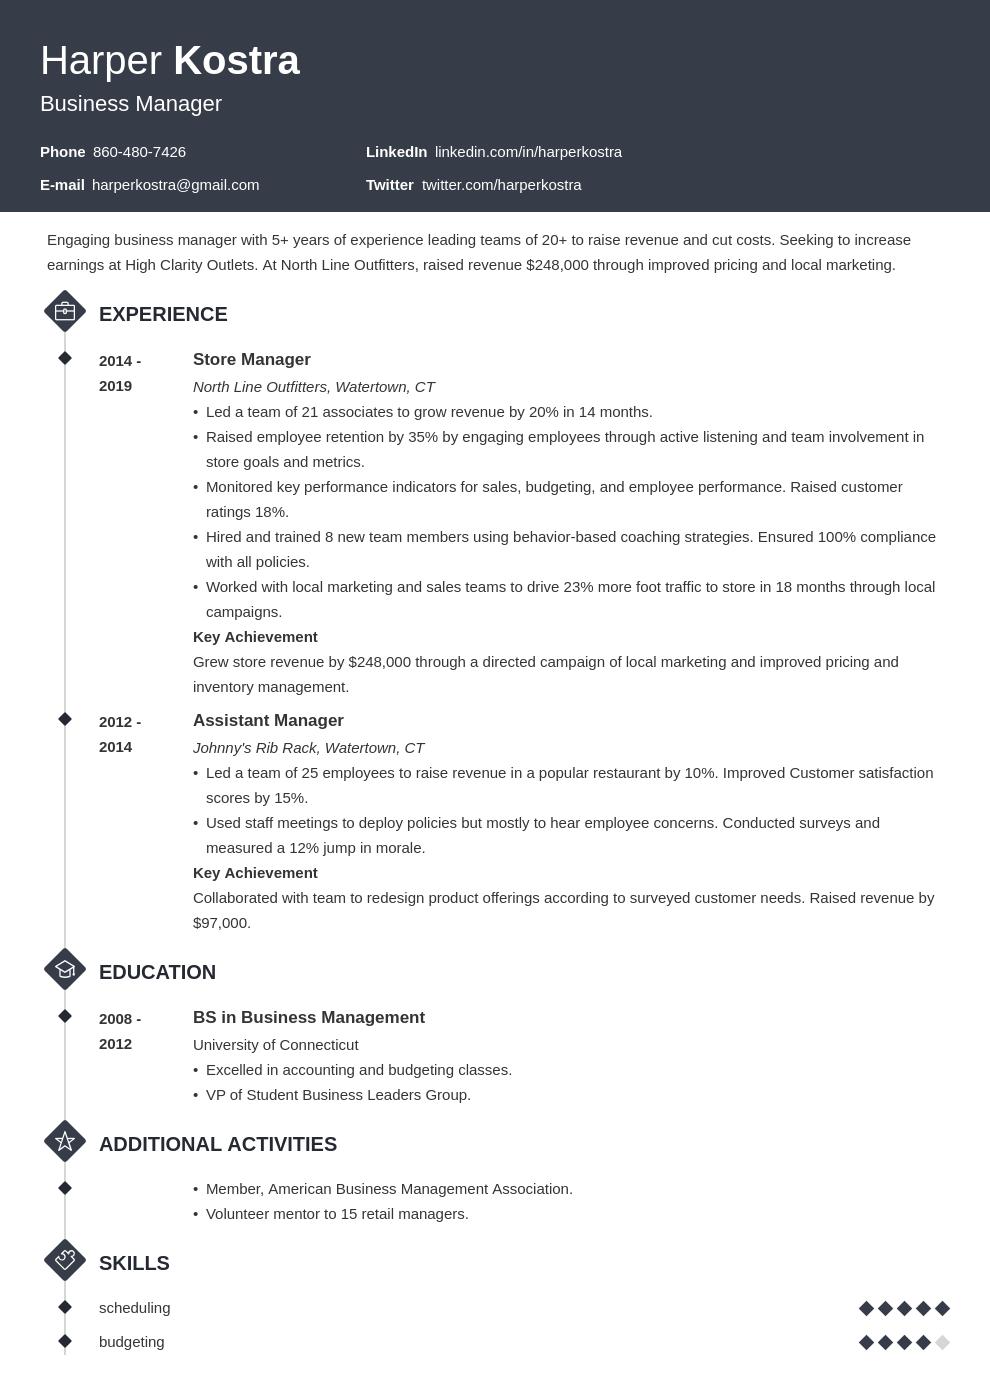 business manager template diamond uk